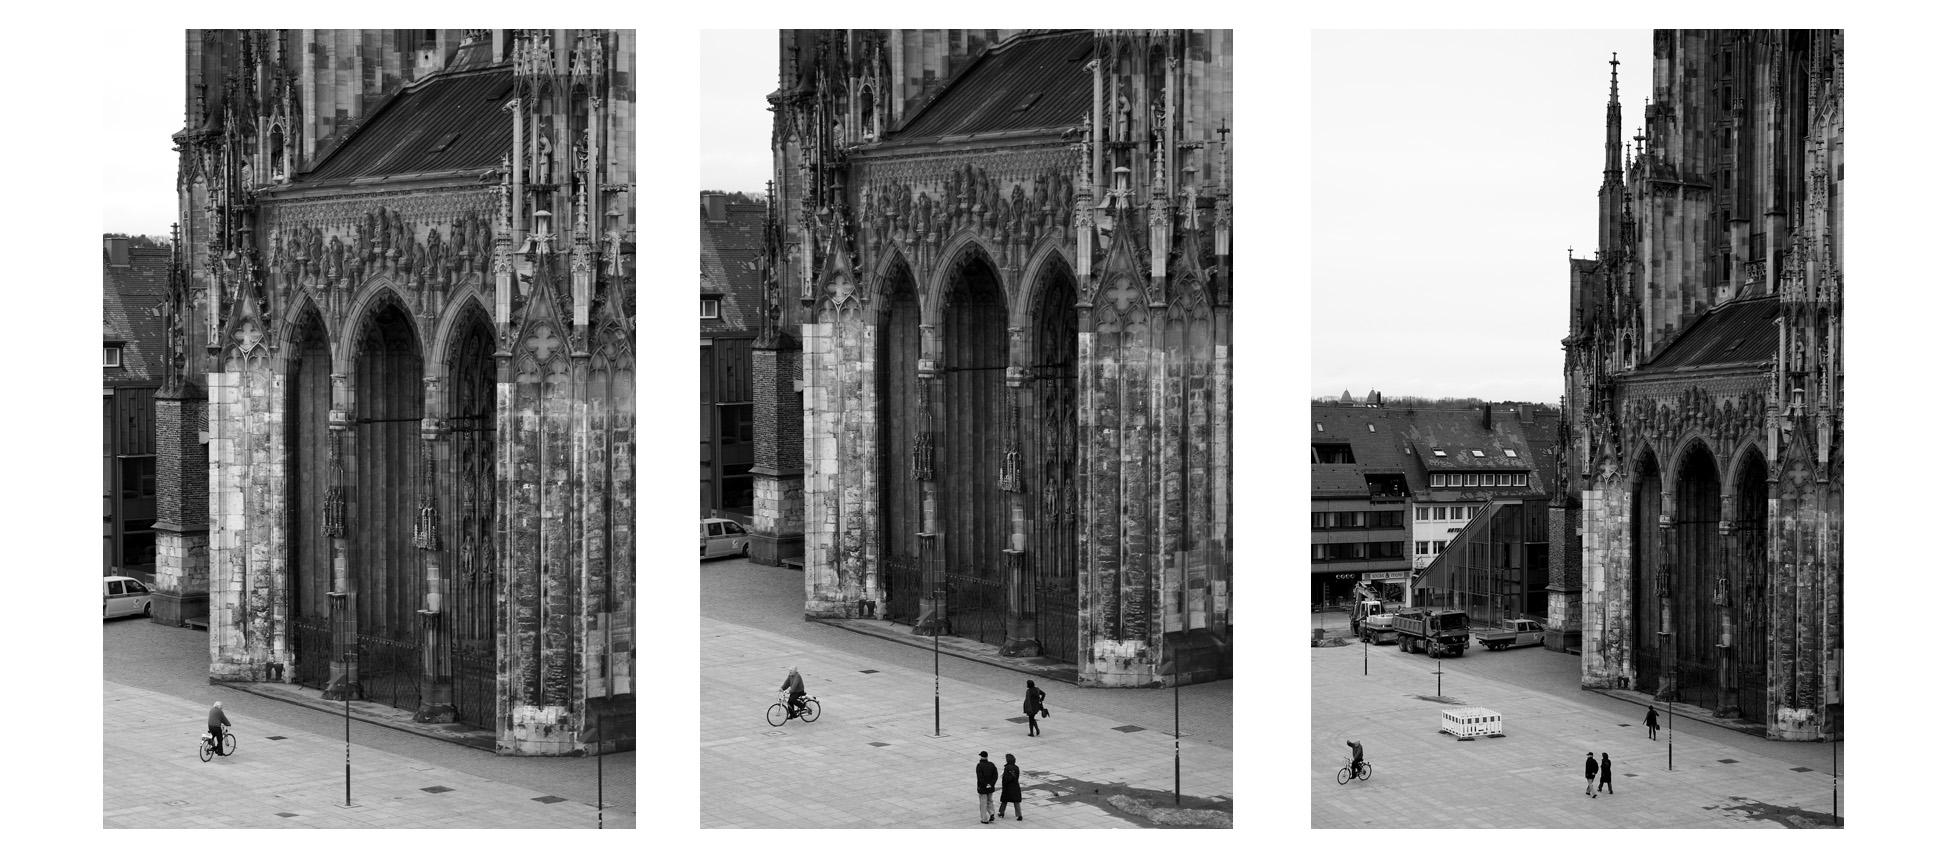 Radfahrer in Ulm